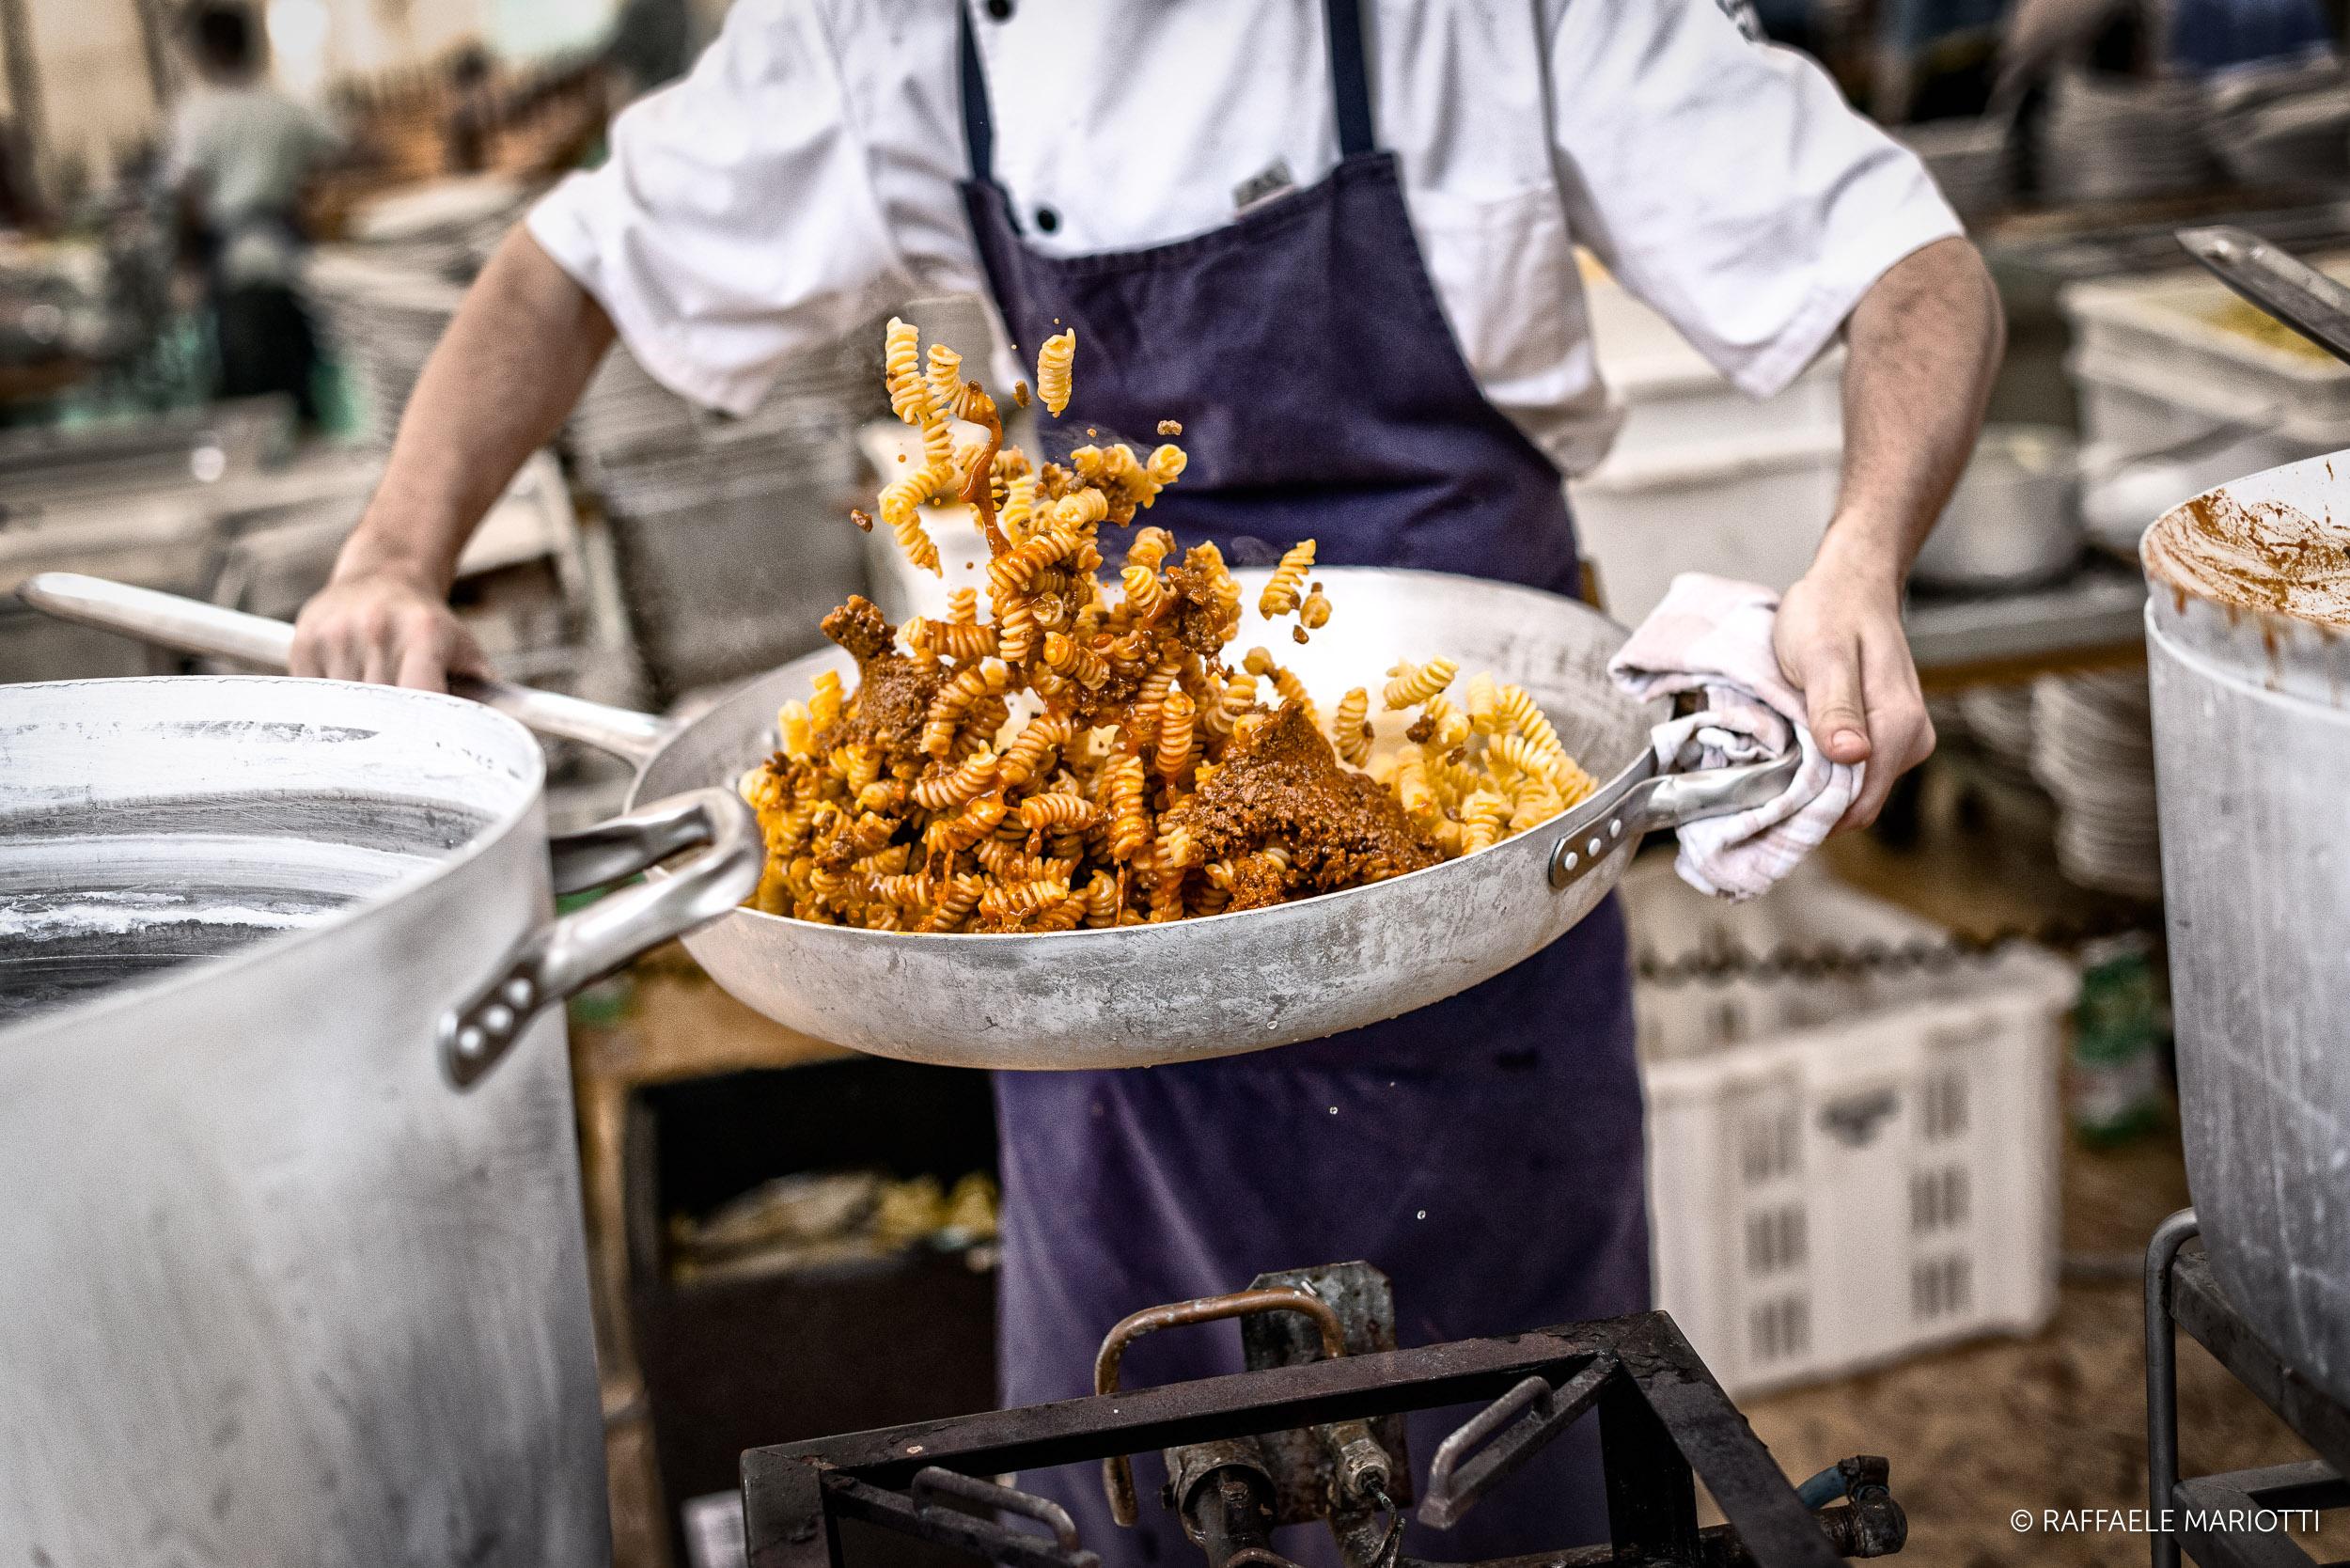 Catering – Raffaele Mariotti fotografo food